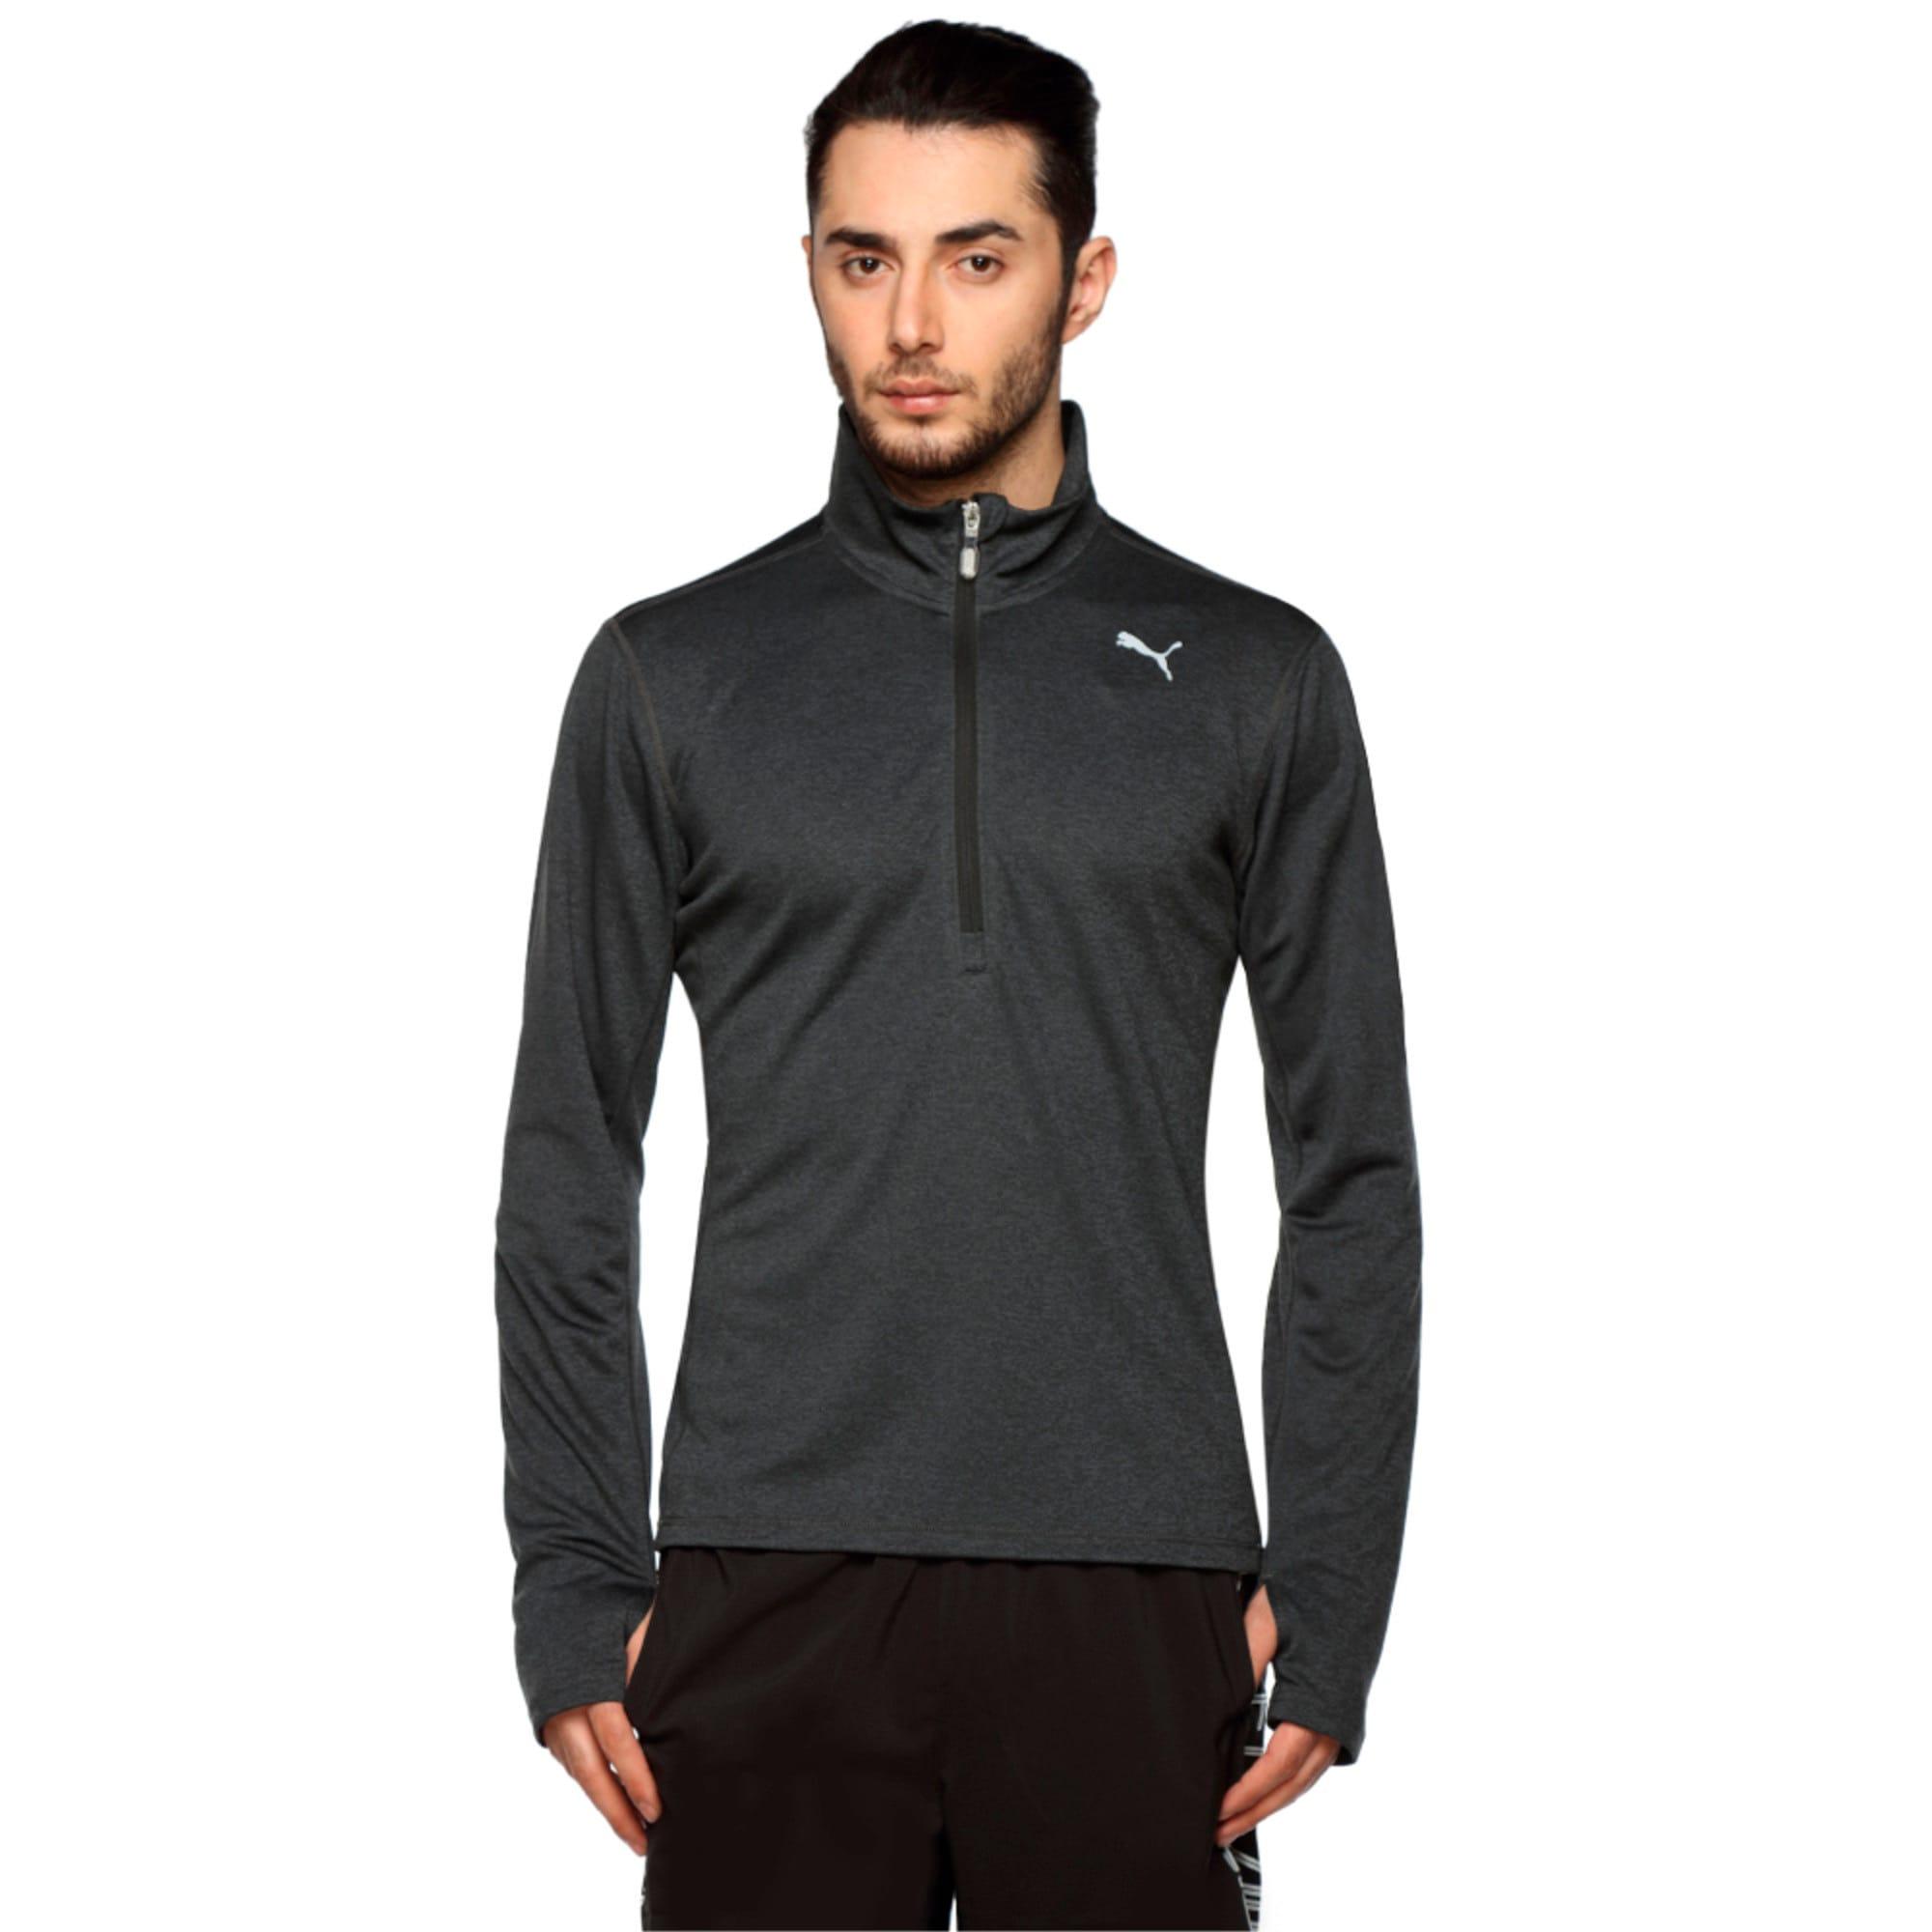 Thumbnail 1 of Running Men's Half Zip Long Sleeve, Black Heather-dtm stitching, medium-IND